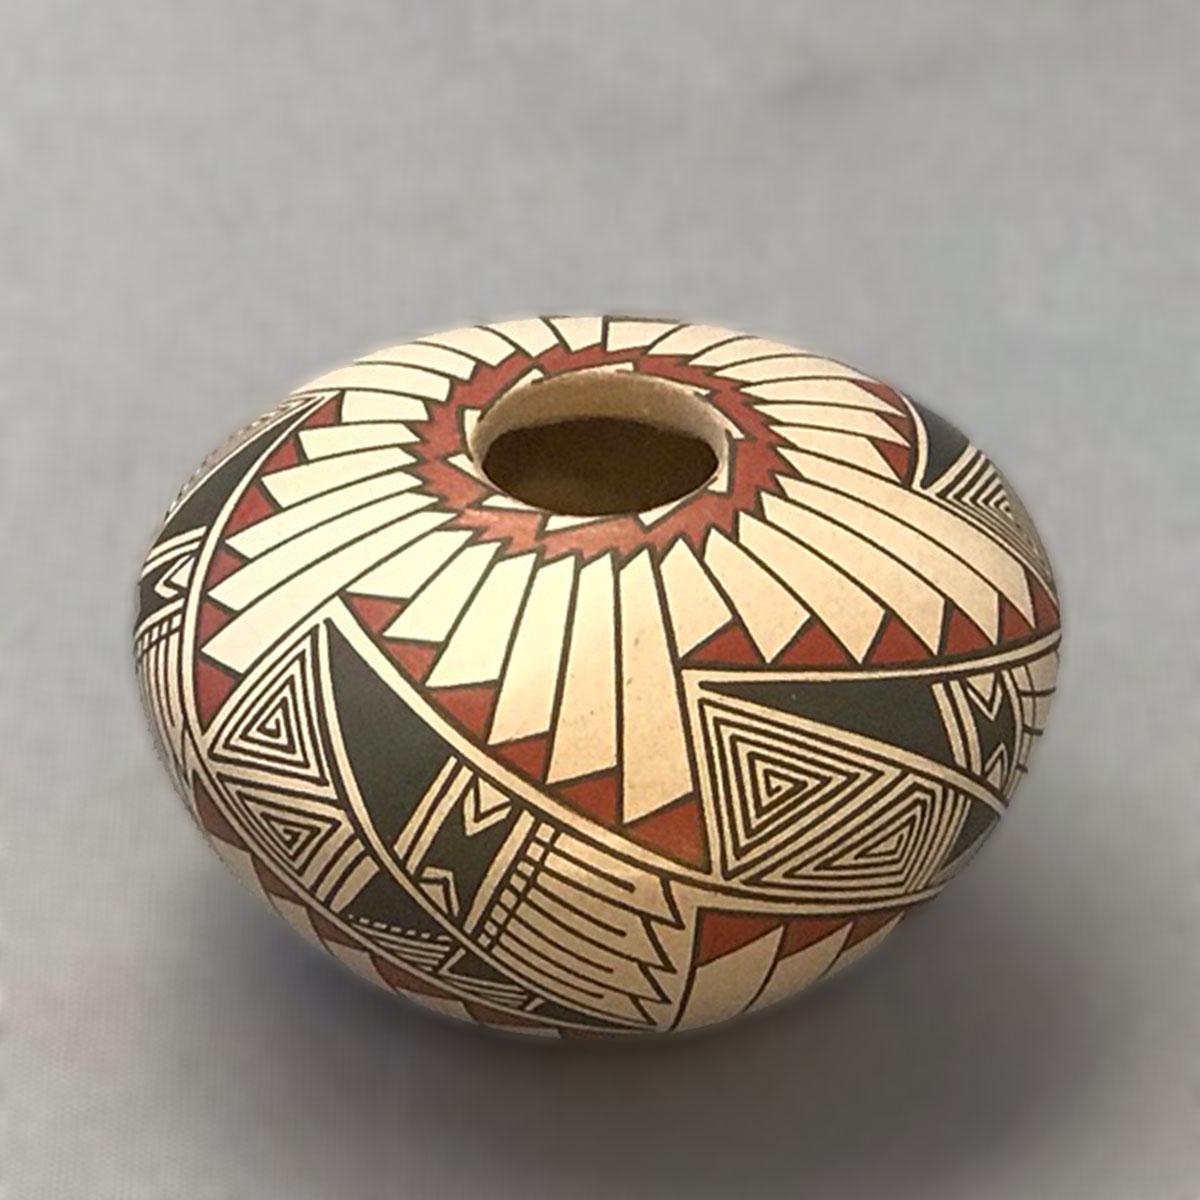 Blanca Quezada Blanca Quezada: Small Round Feathered Pot Mata Ortiz Pottery